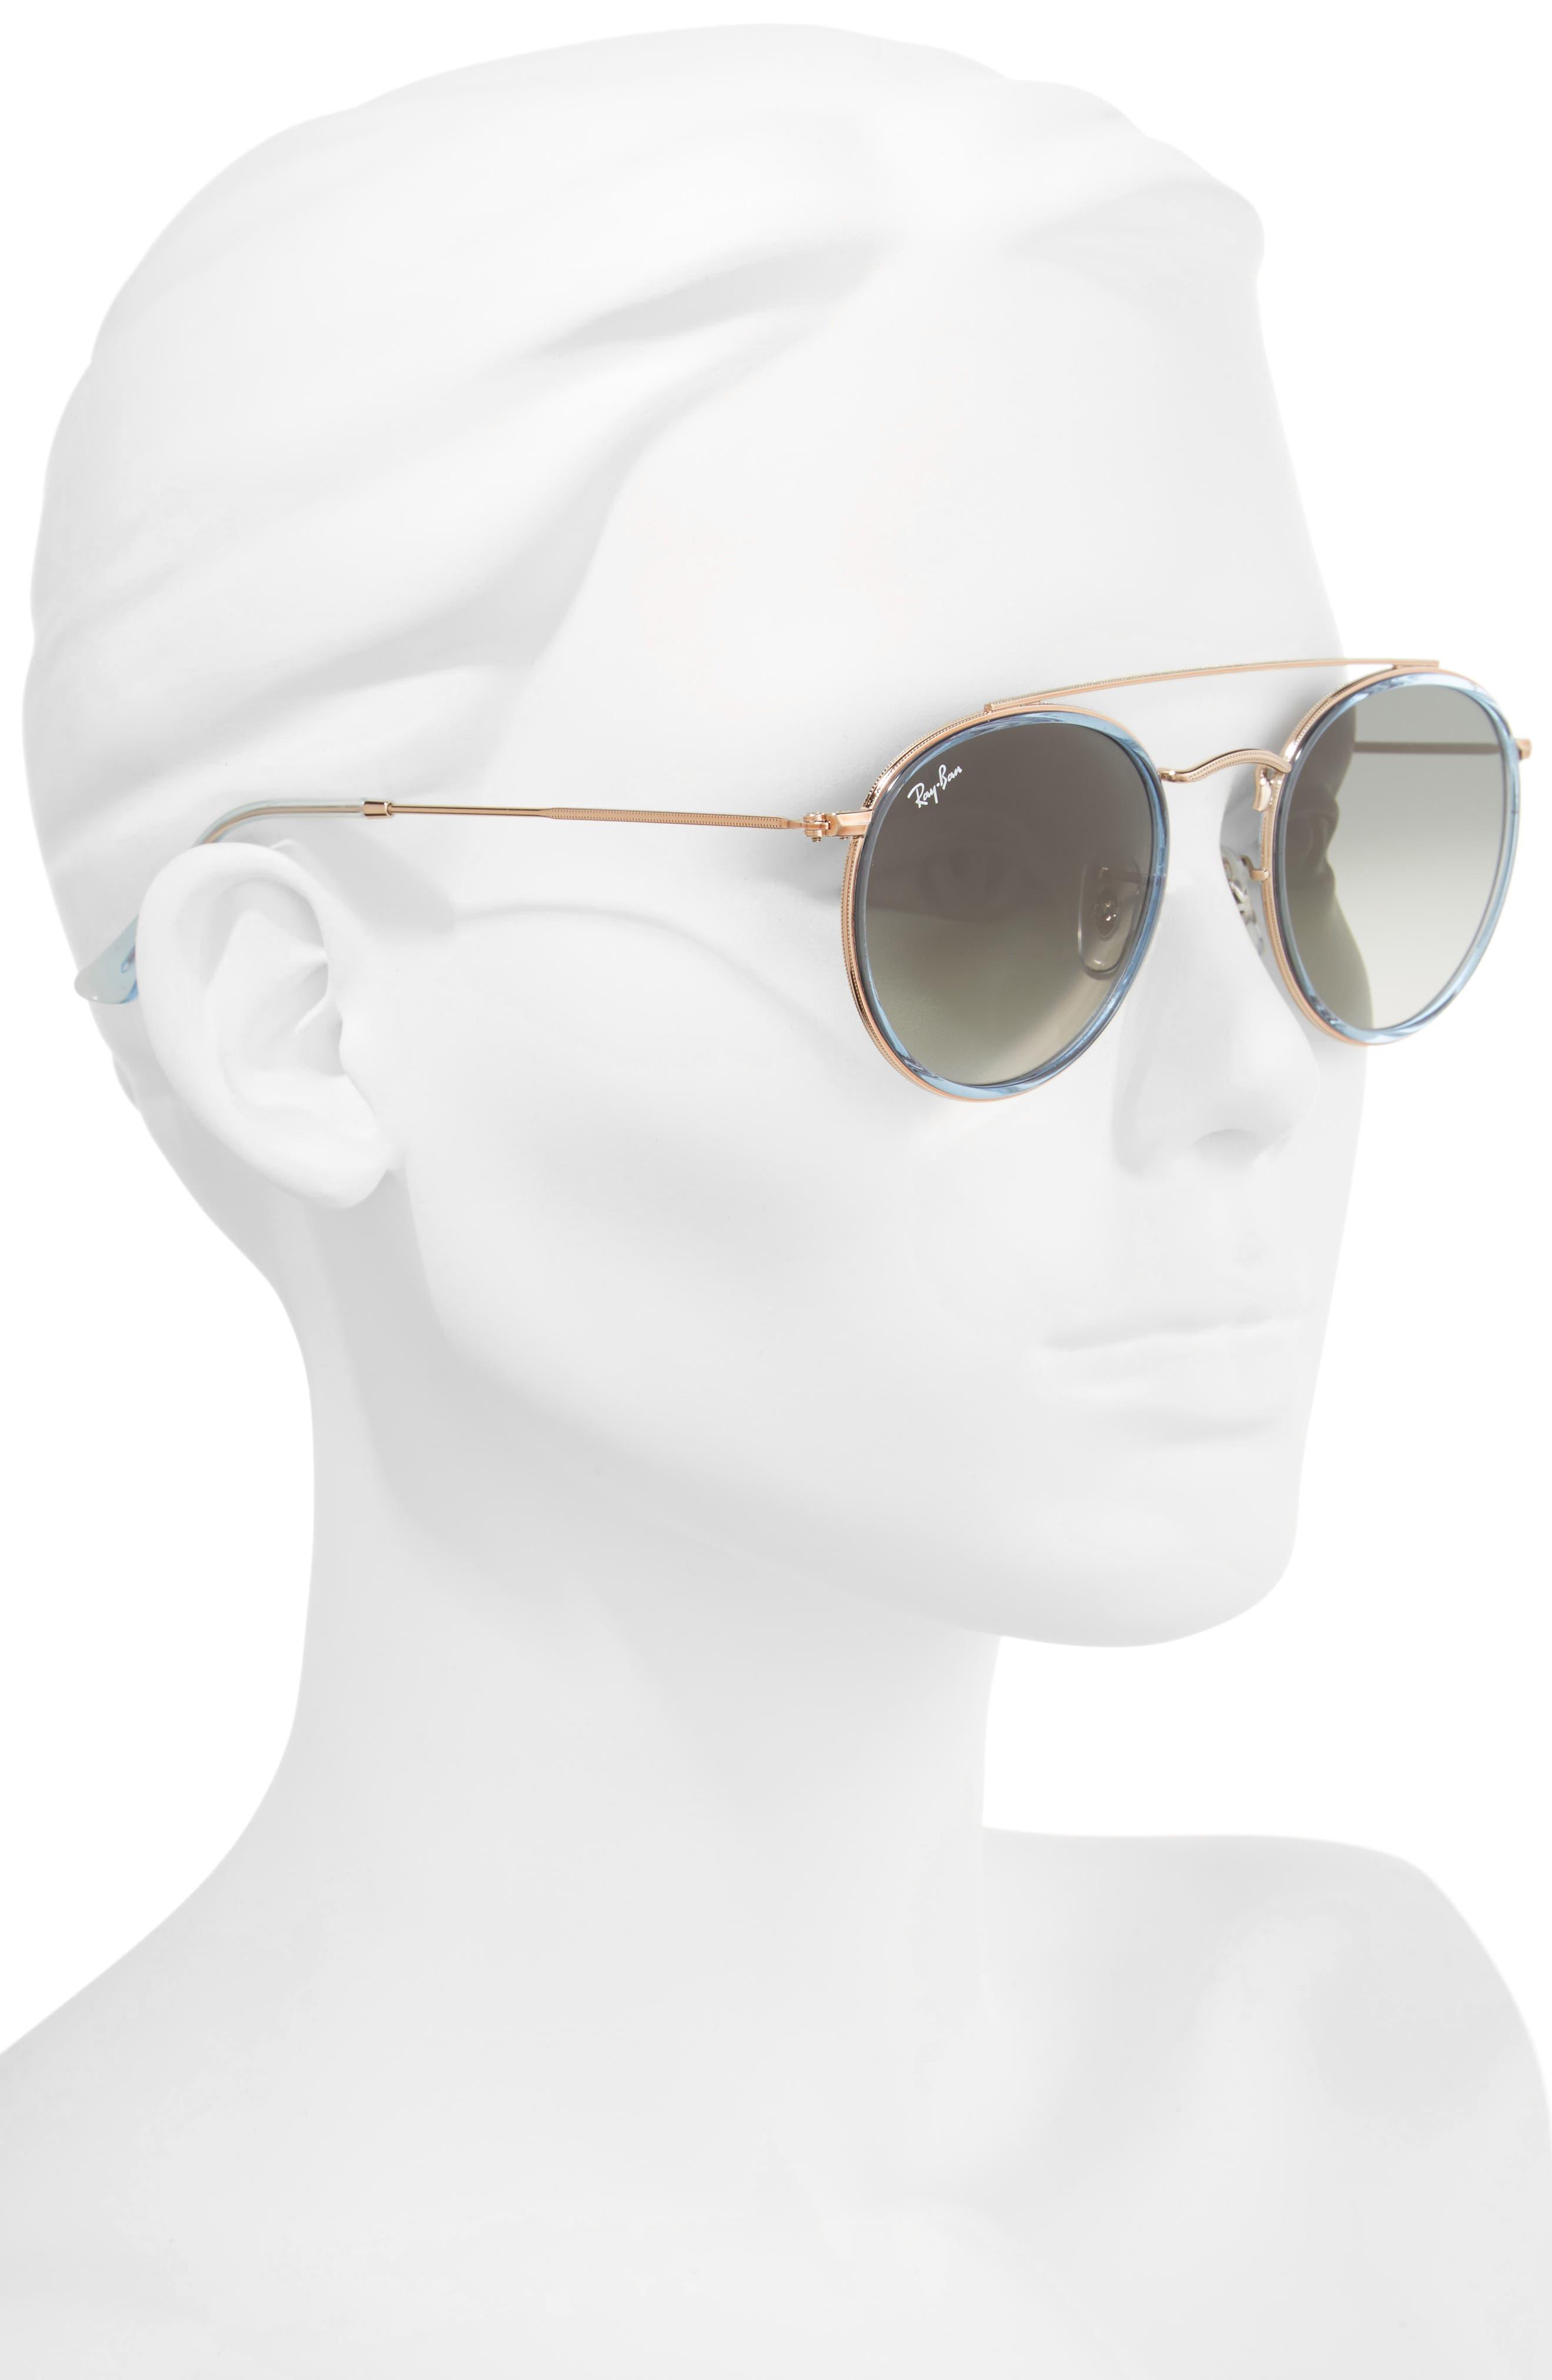 51mm Aviator Gradient Lens Sunglasses,                             Alternate thumbnail 8, color,